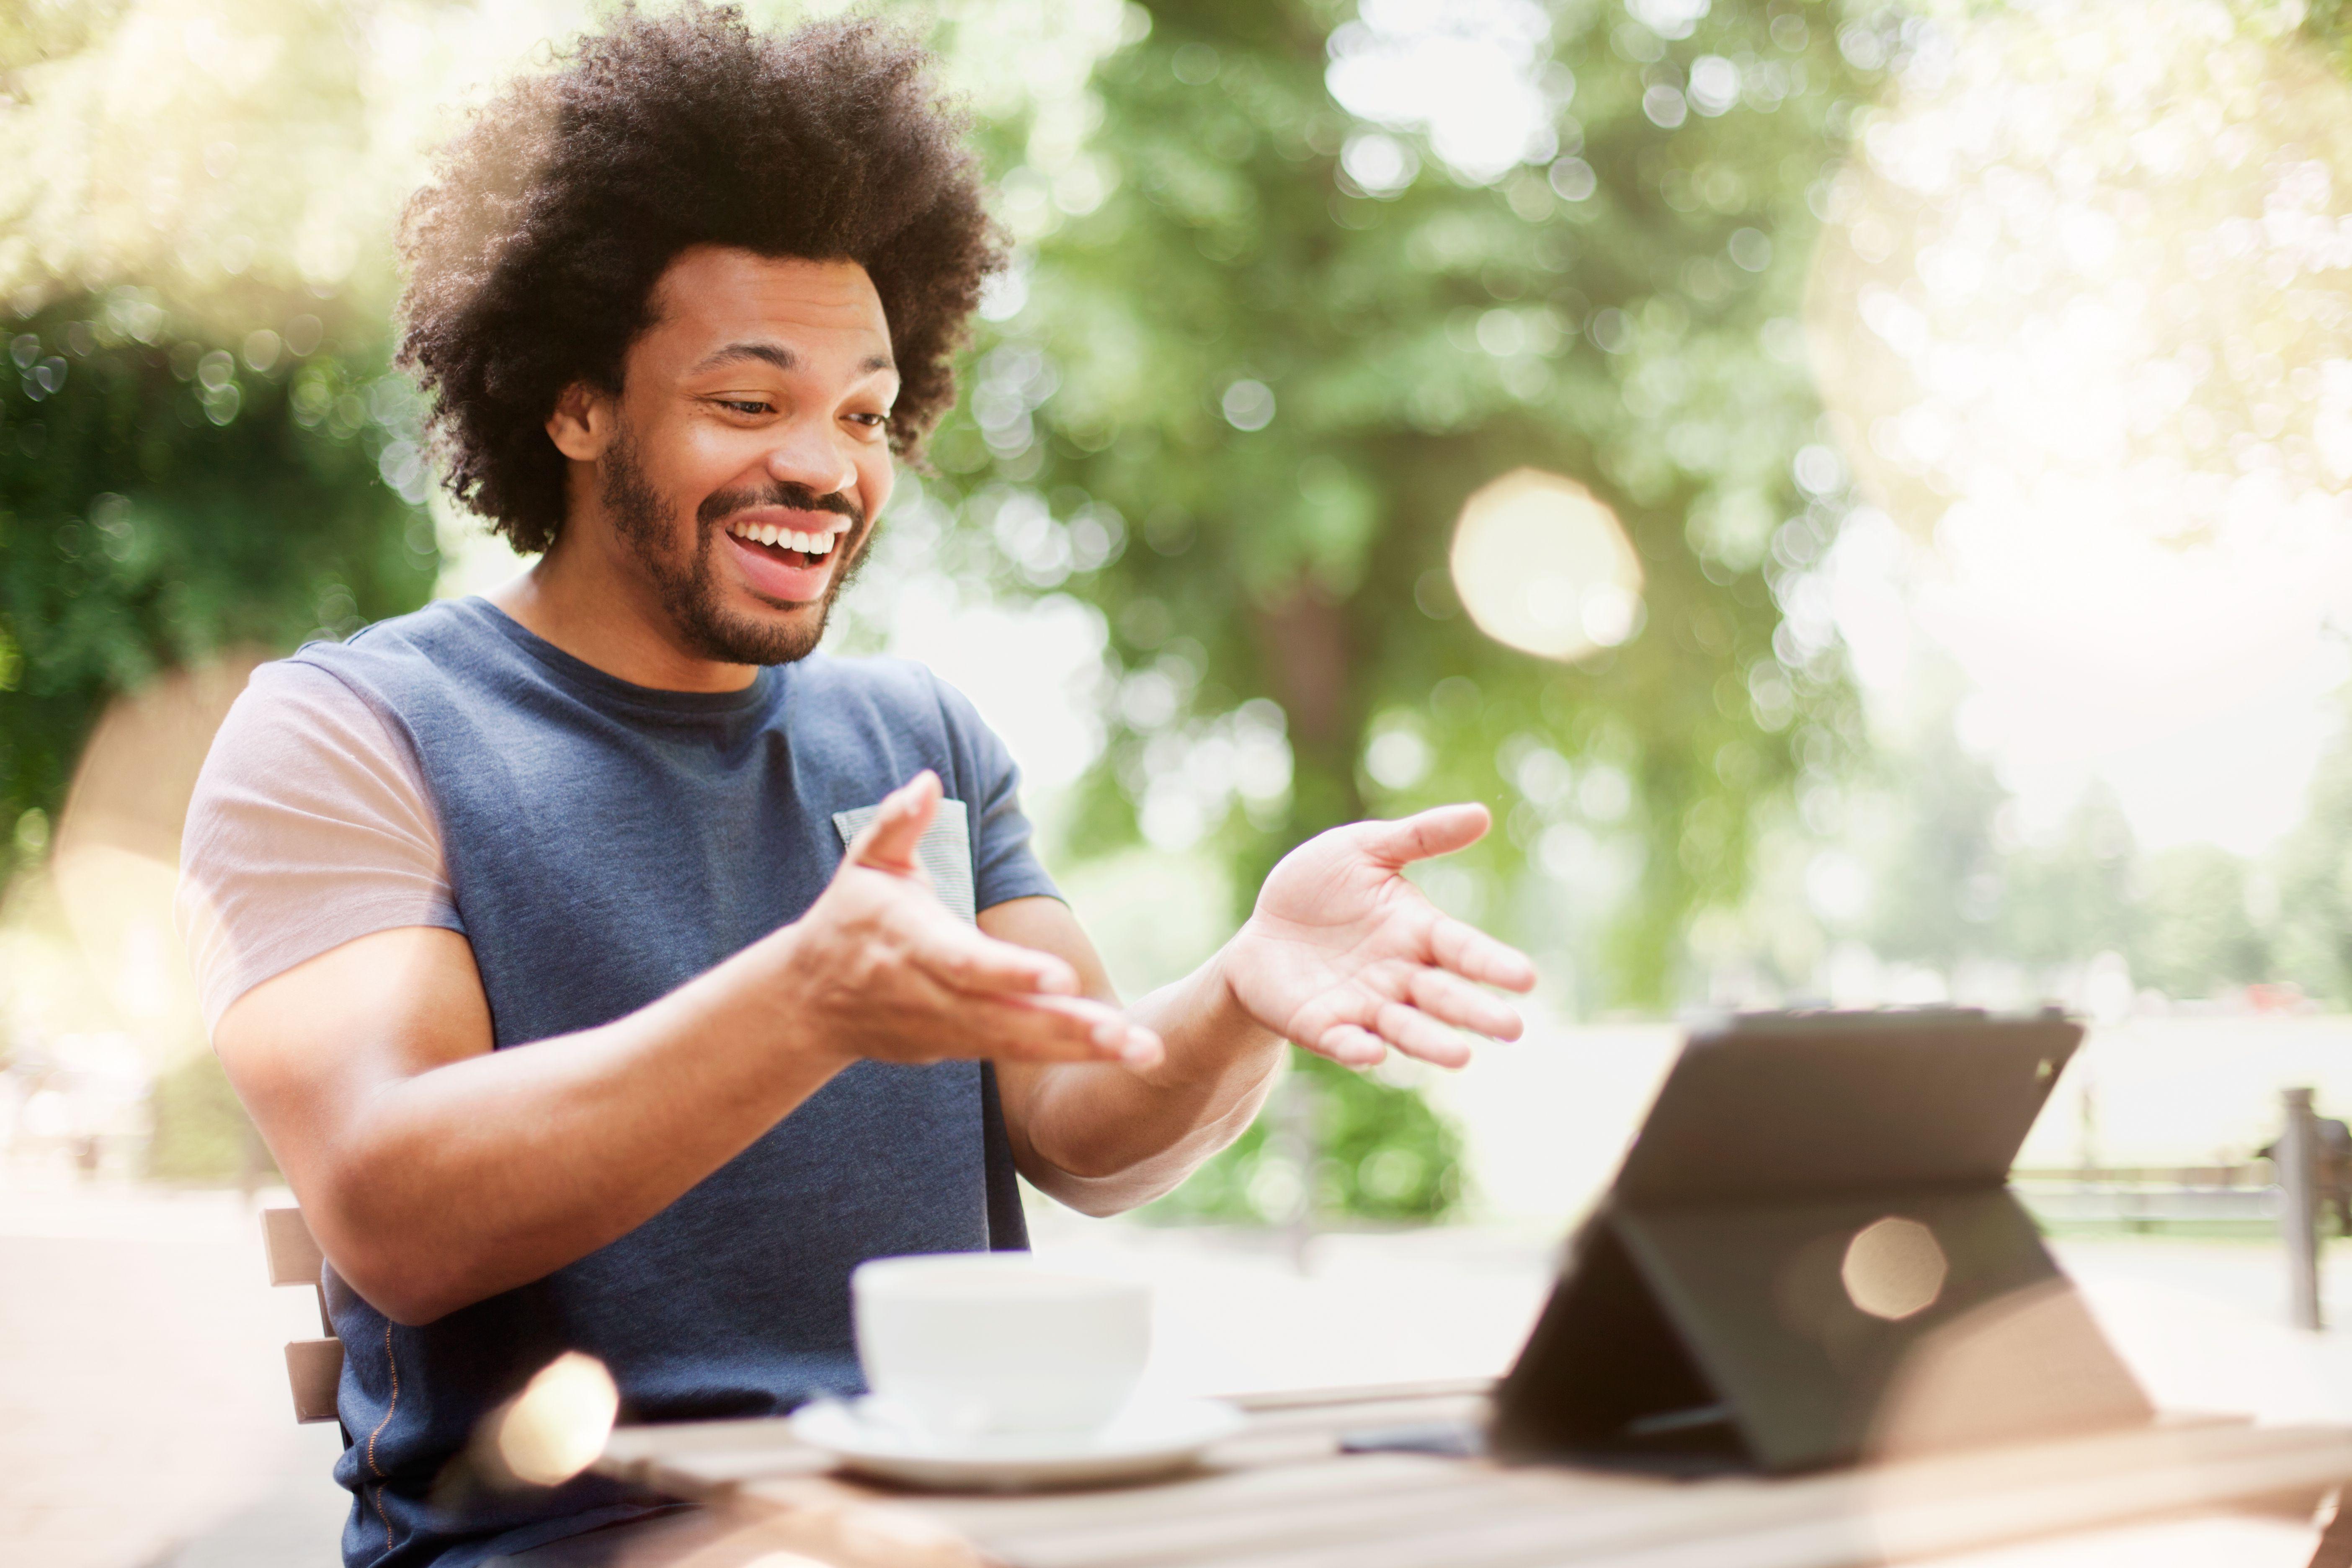 Man responding to screen of digital tablet.